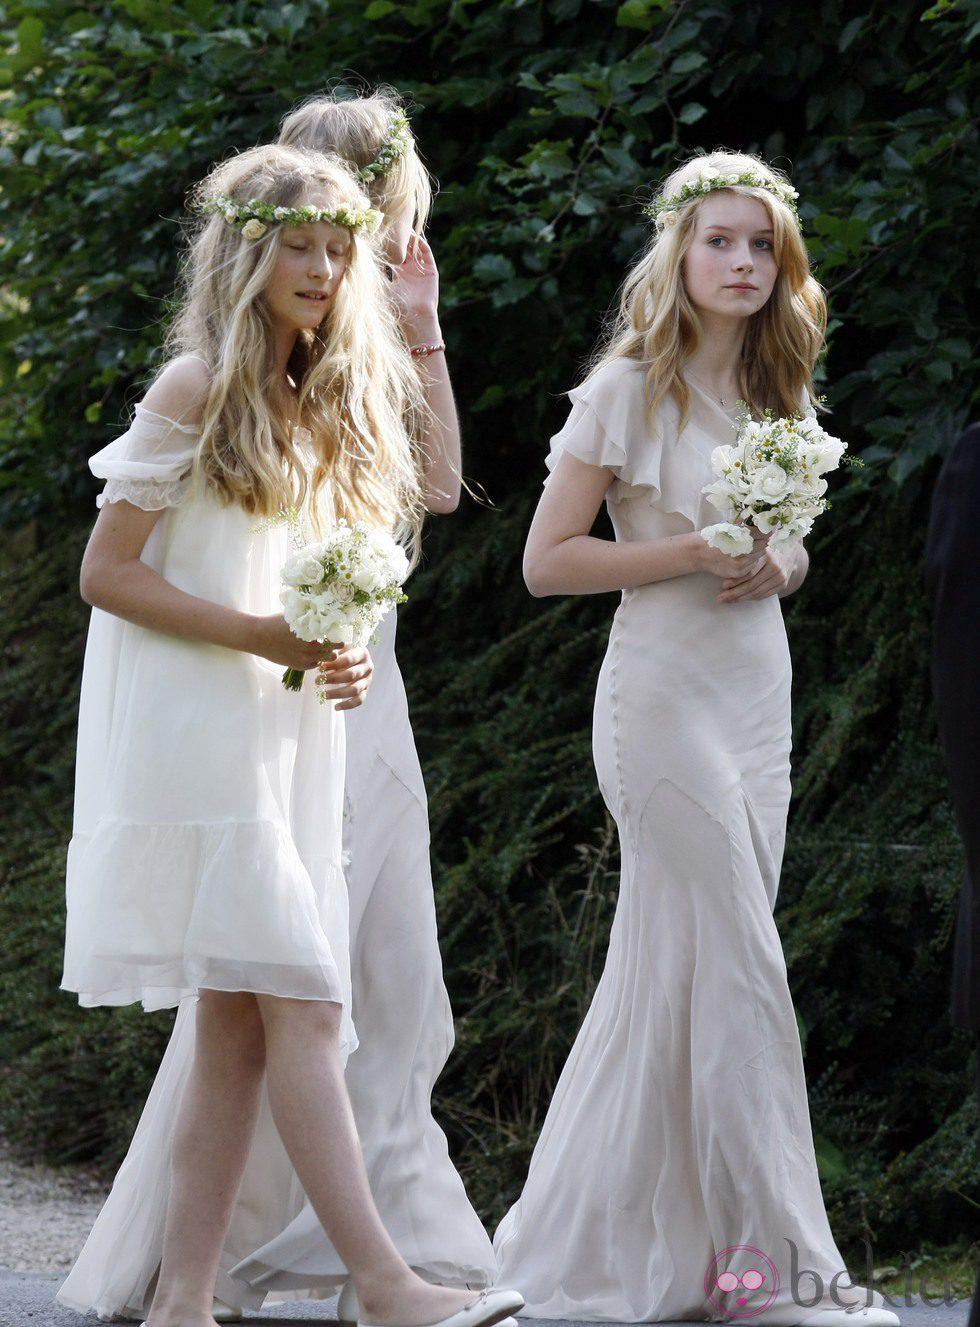 Lottie Moss en la boda de su hermana Kate Moss con Jamie Hince